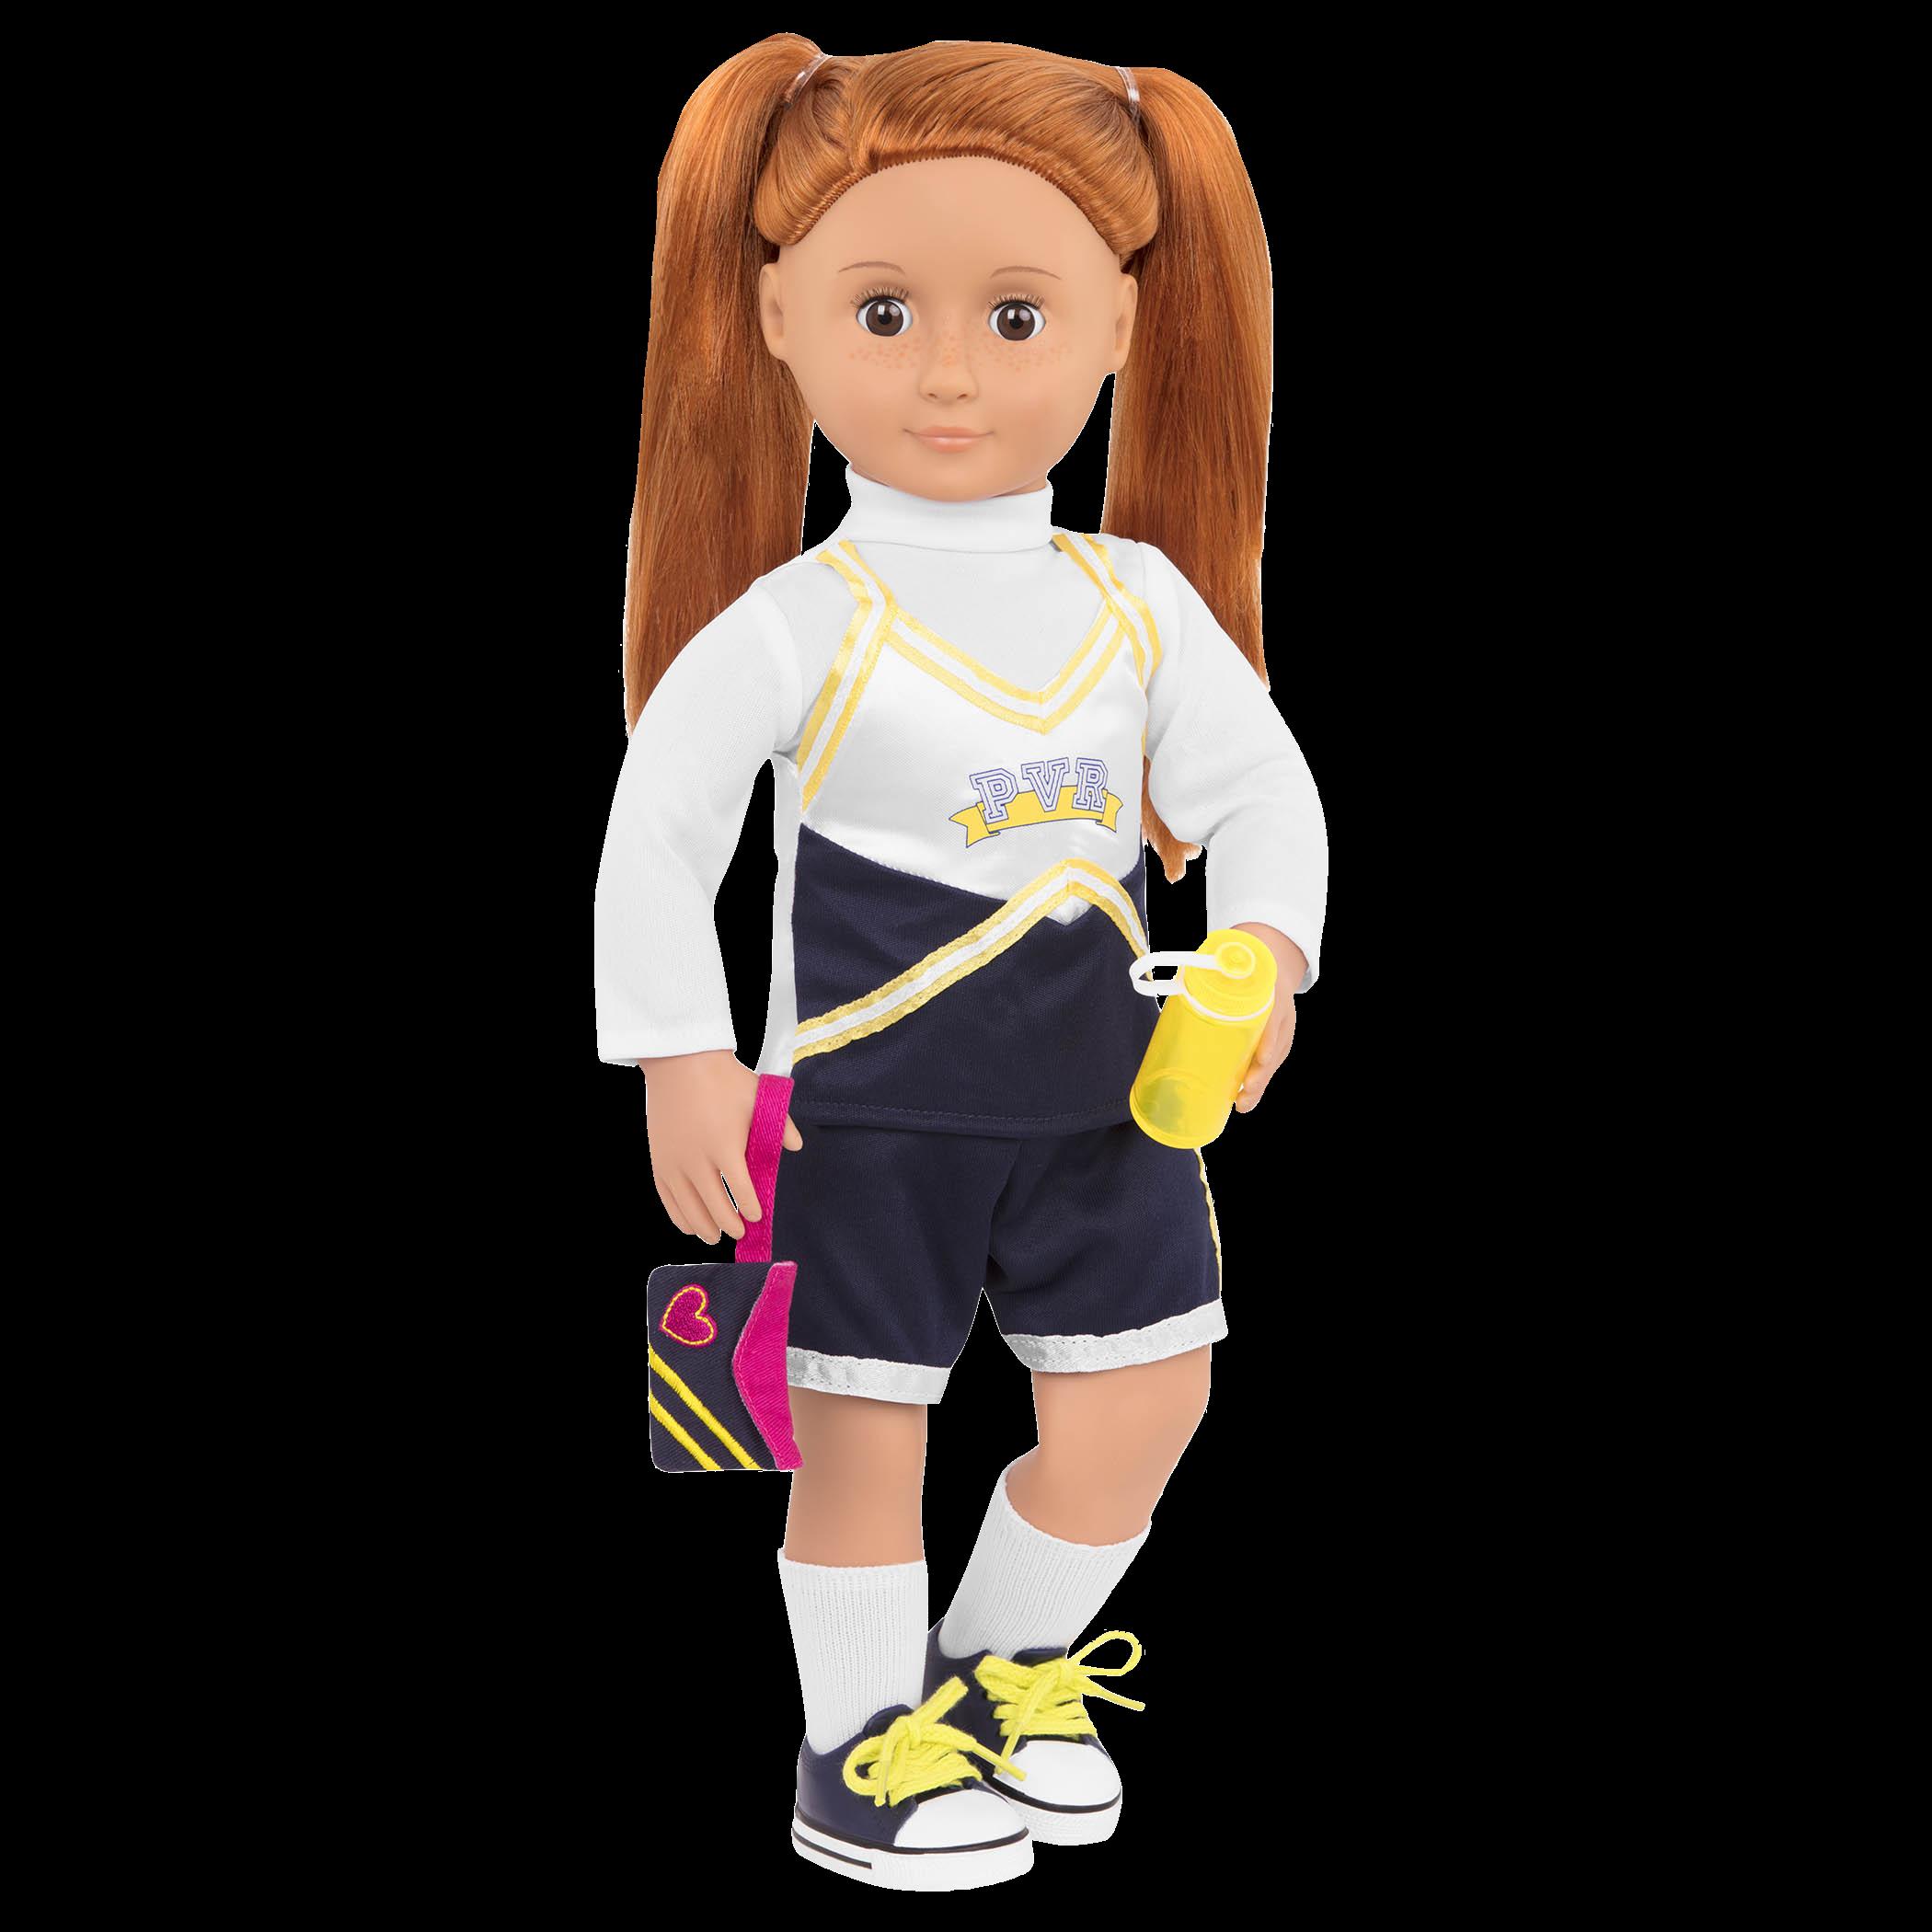 Cheerleader Camp Set Noa doll wearing uniform